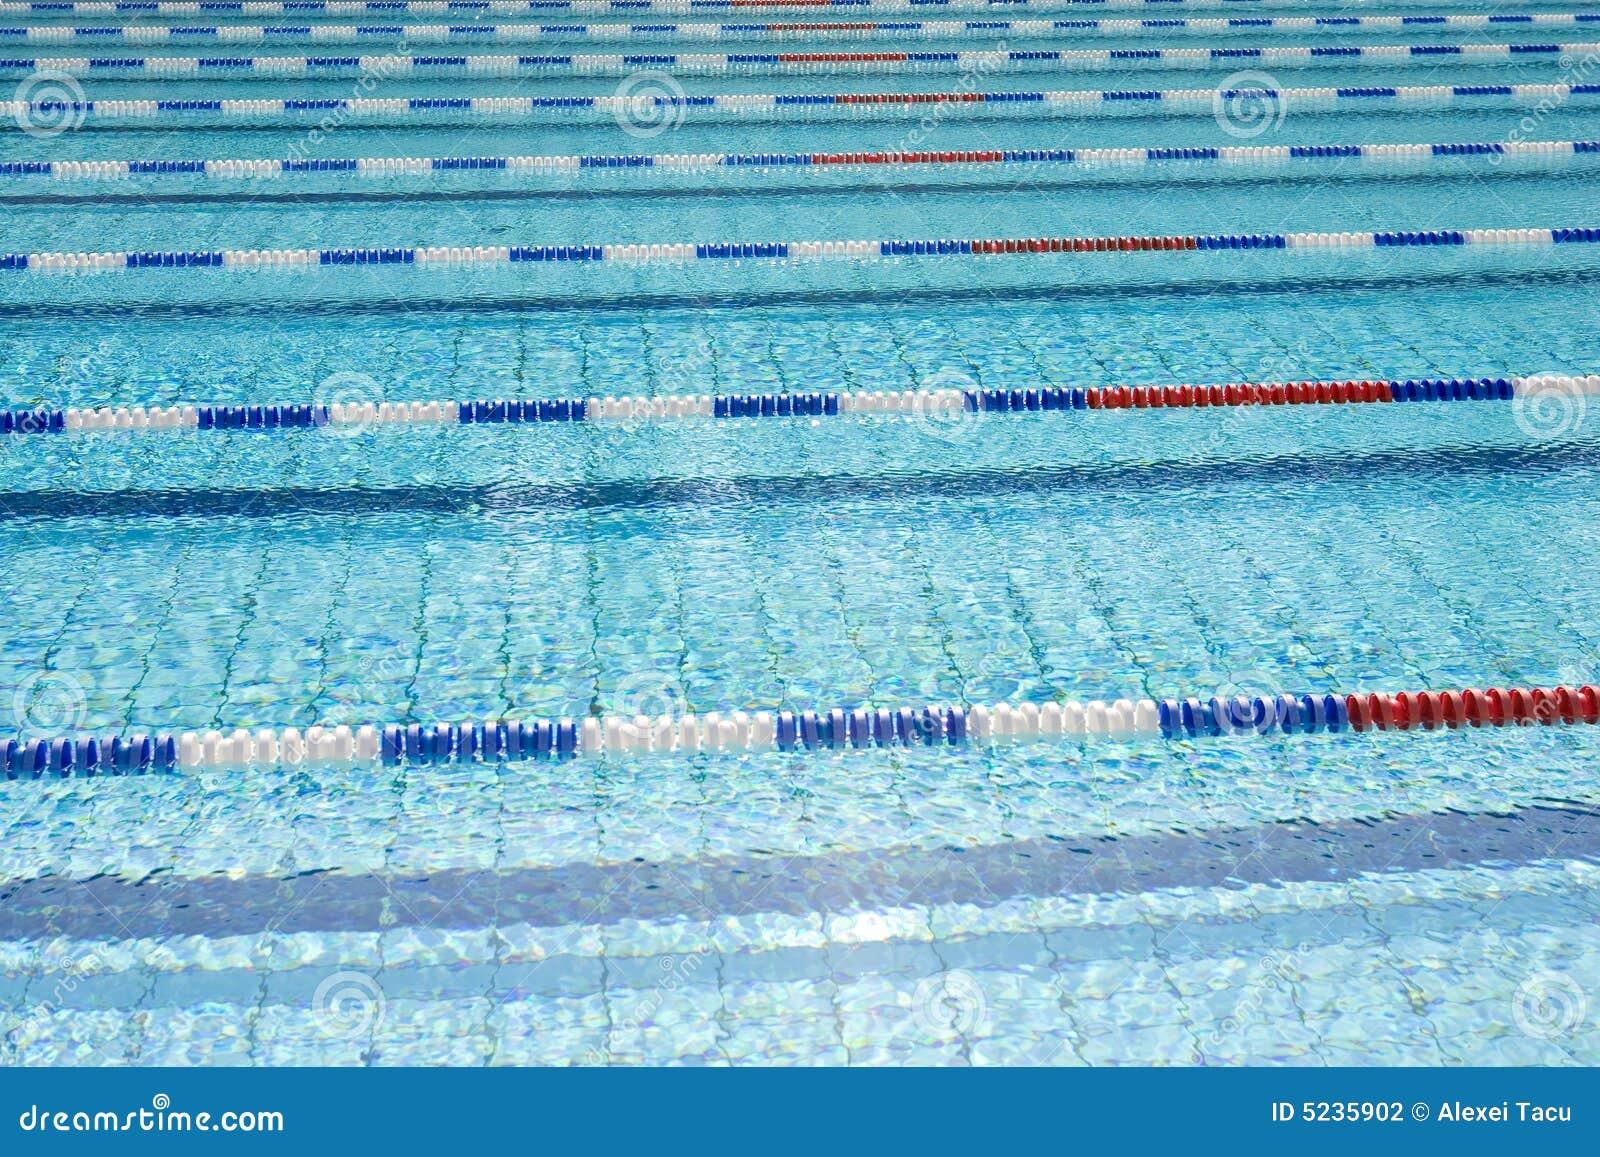 Swimming Pool Stock Photography Image 5235902